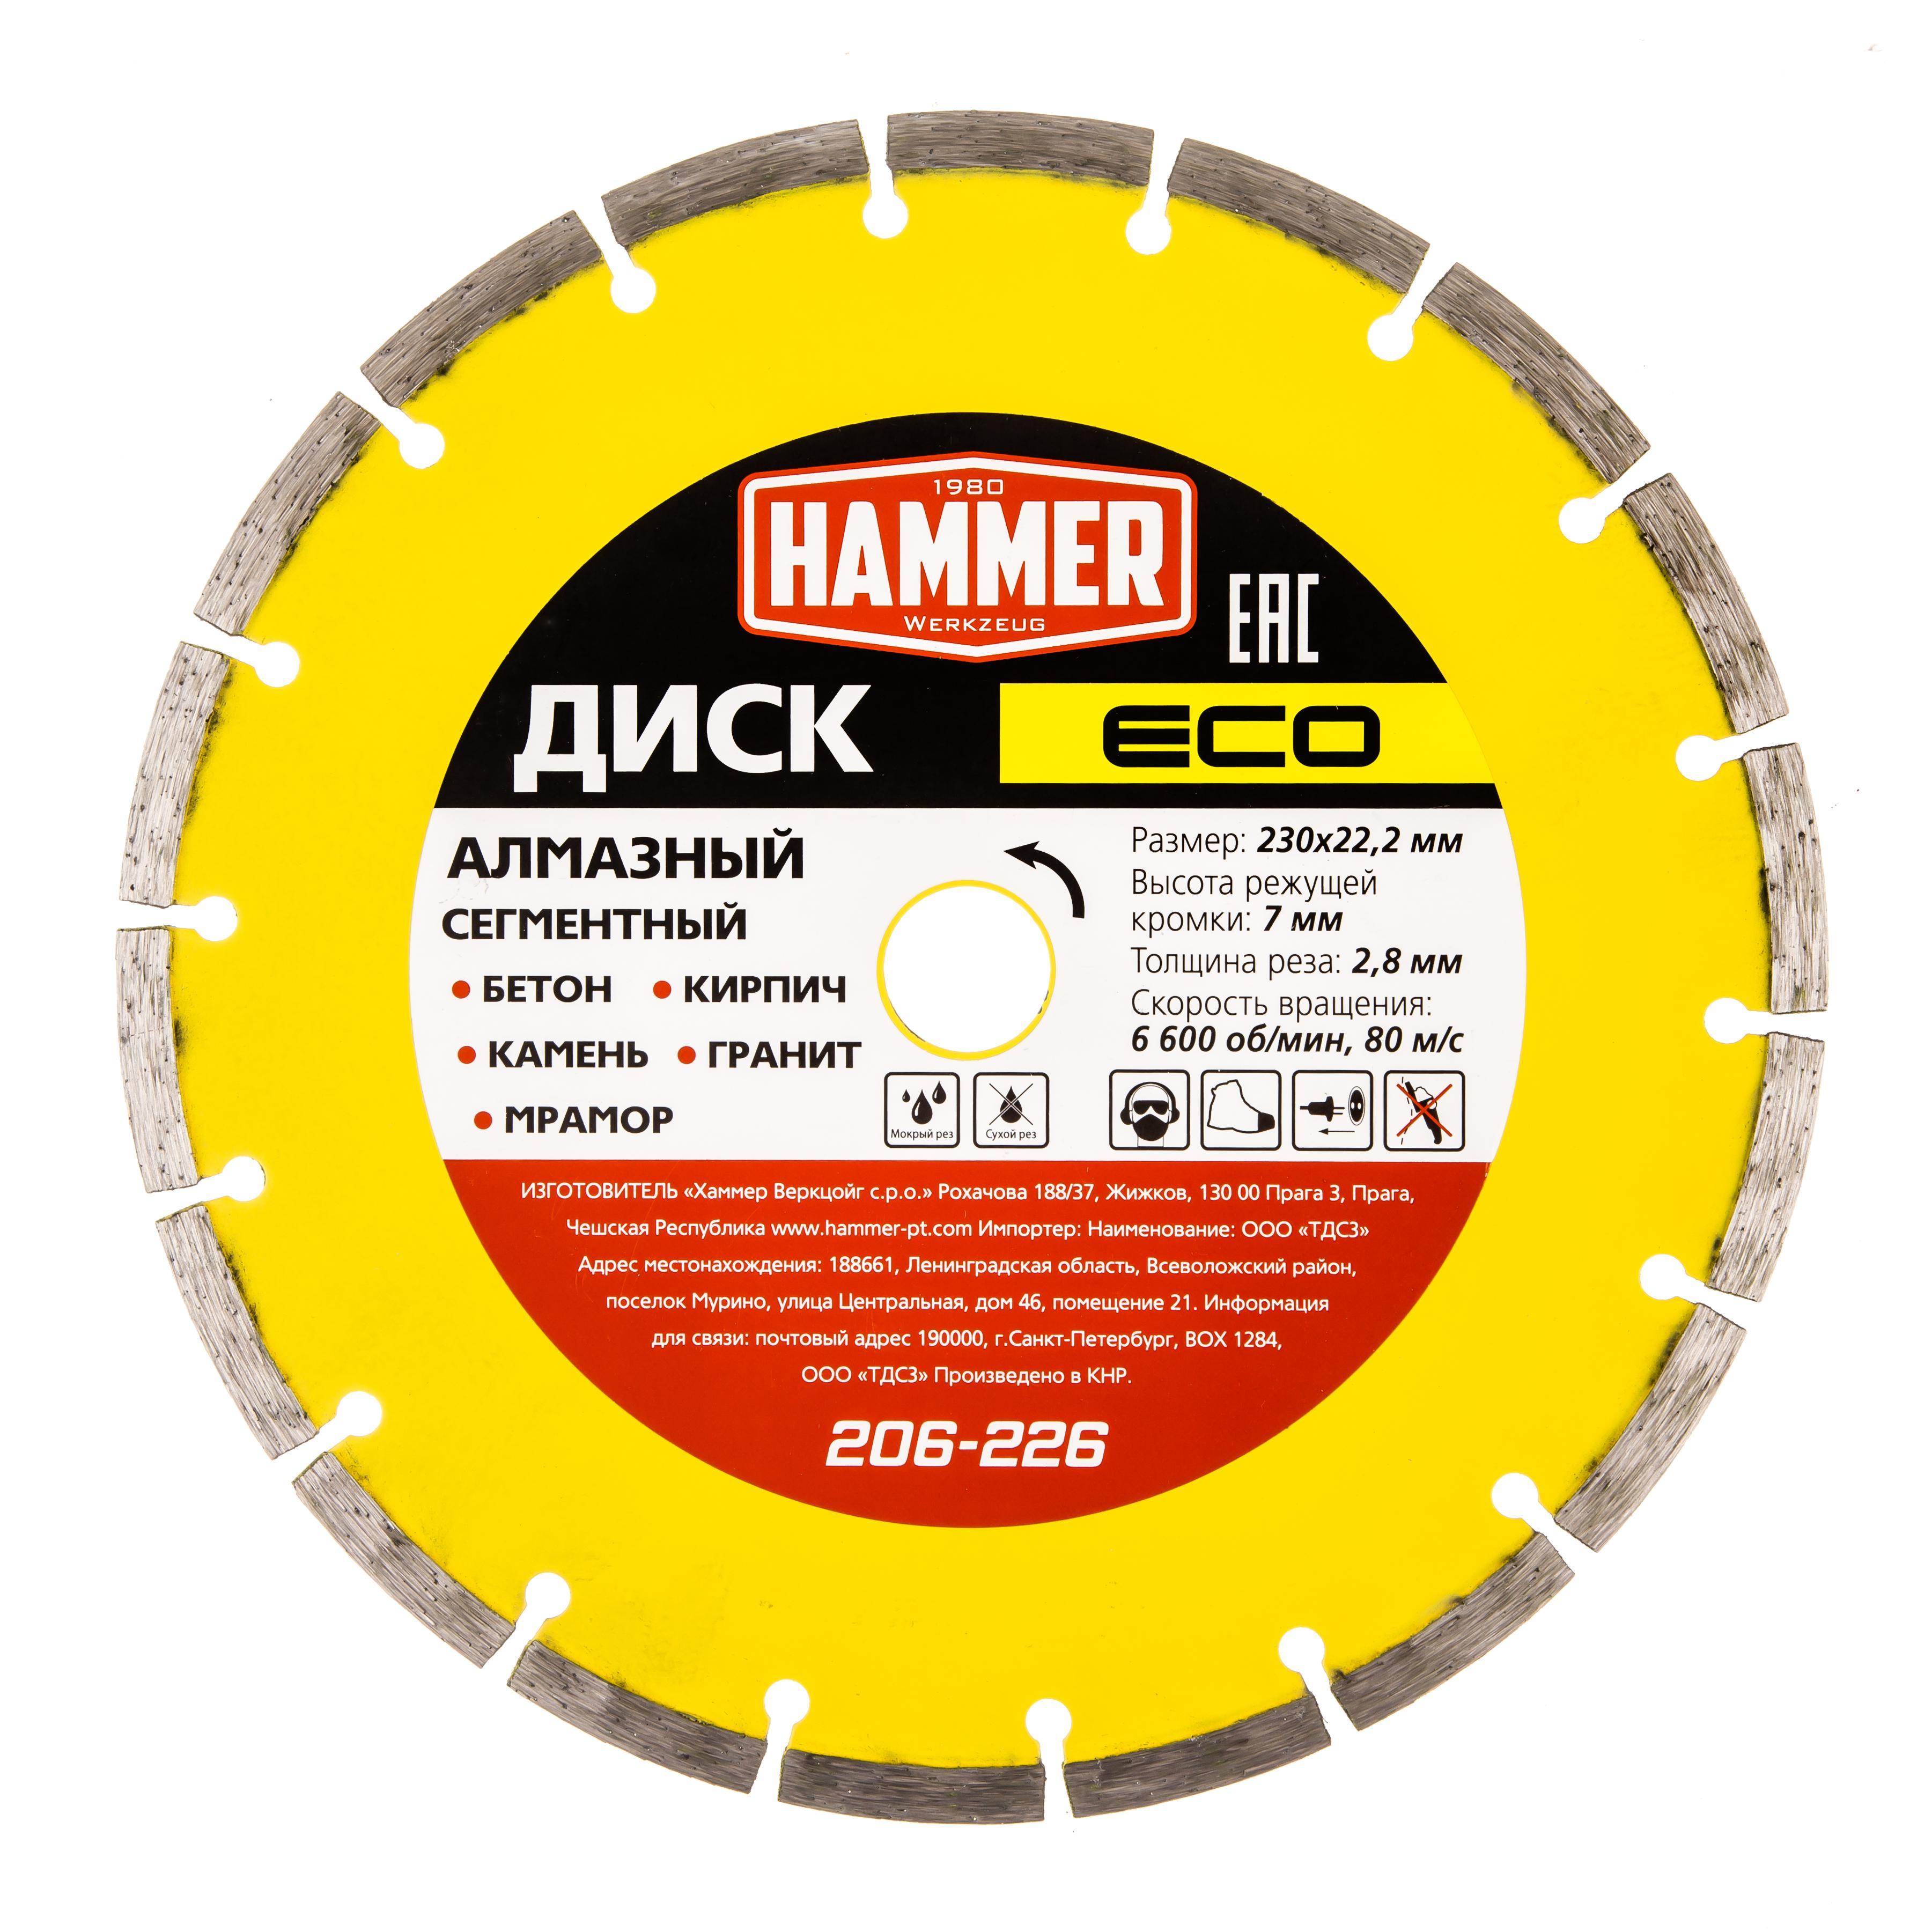 Круг алмазный Hammer (206-226) Ф230х22мм по бетону круг алмазный hammer ф230х22мм универсальный 206 233